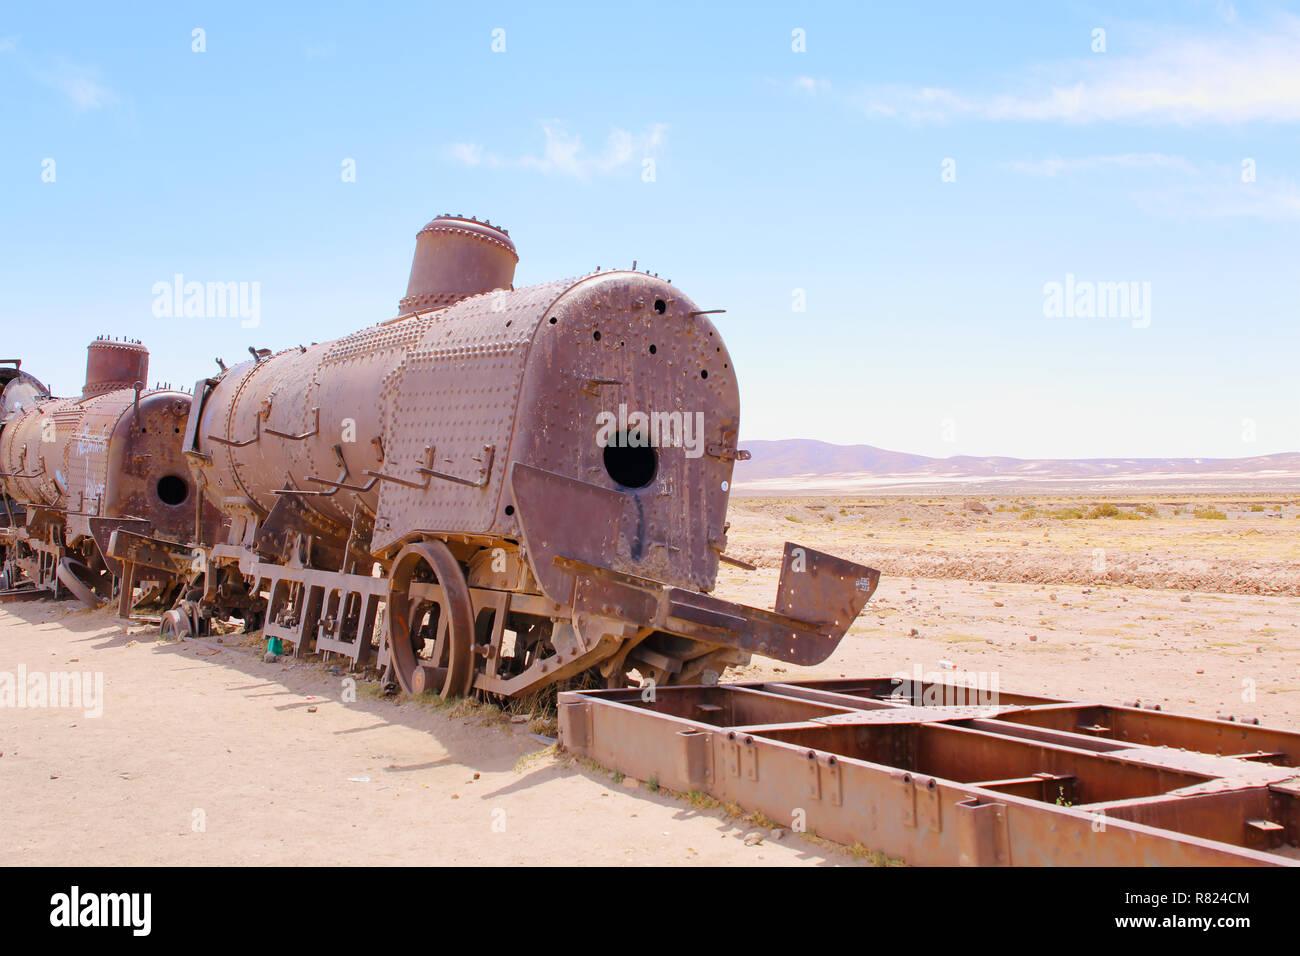 Train Cemetery, in Uyuni, Bolivia near the salt flats. Rusty old steam train. Stock Photo